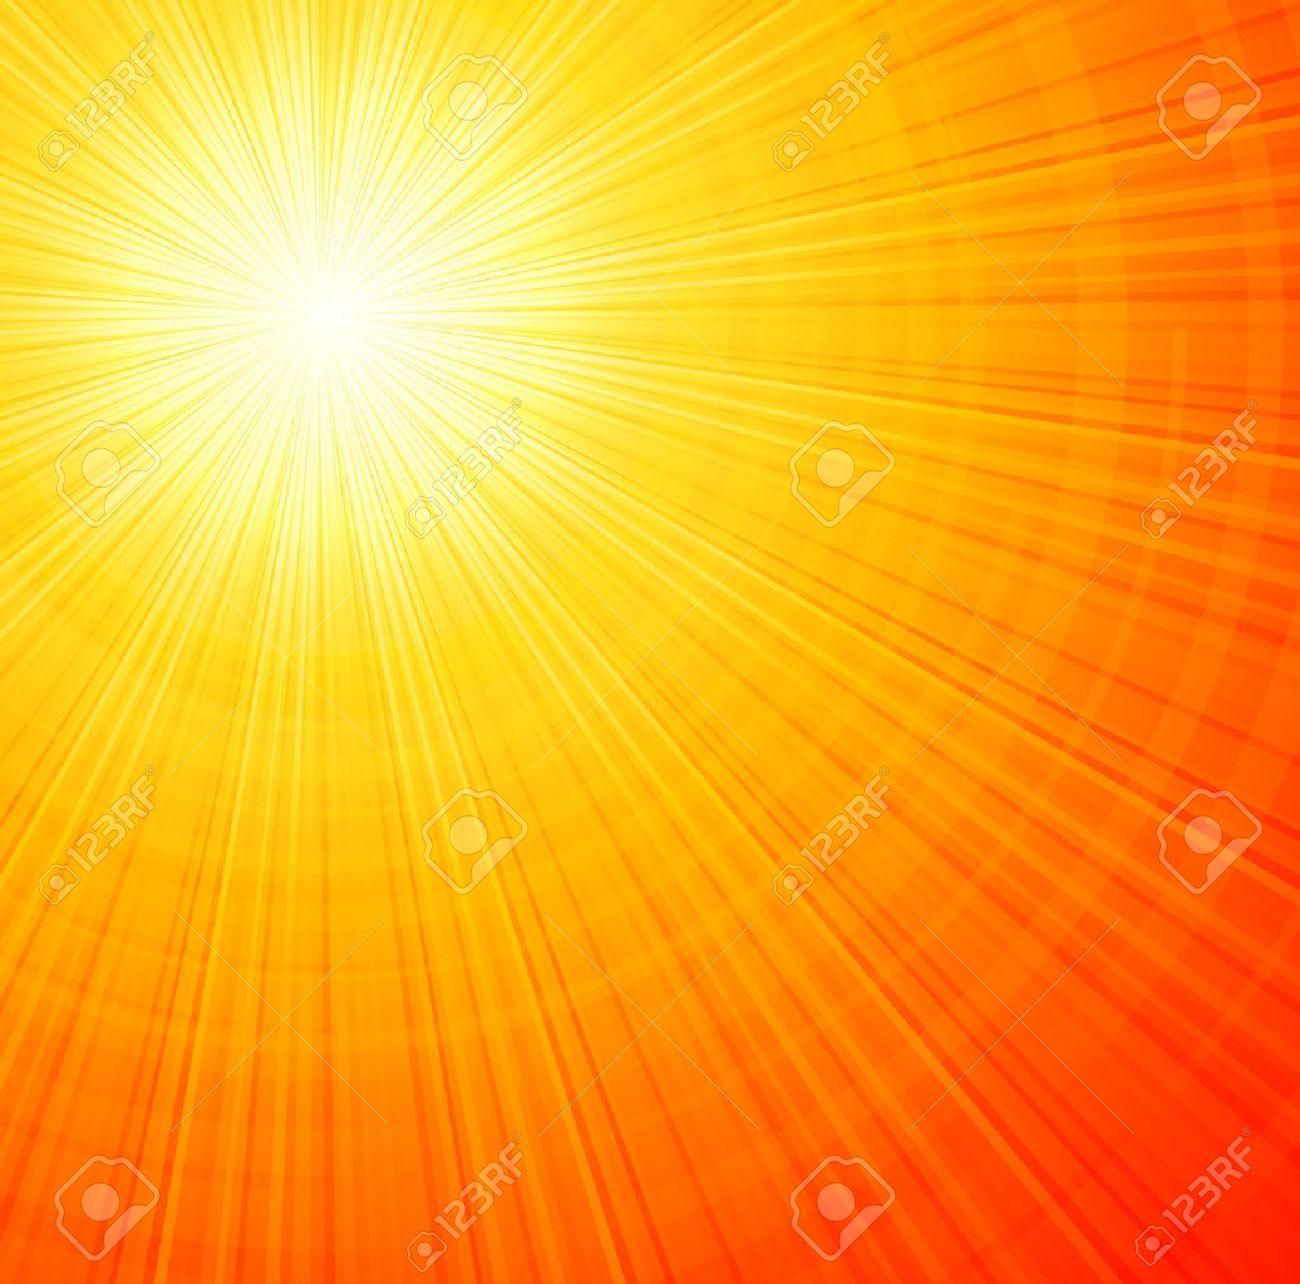 Sunbeams orange abstract vector illustration background EPS 10 - 45633516